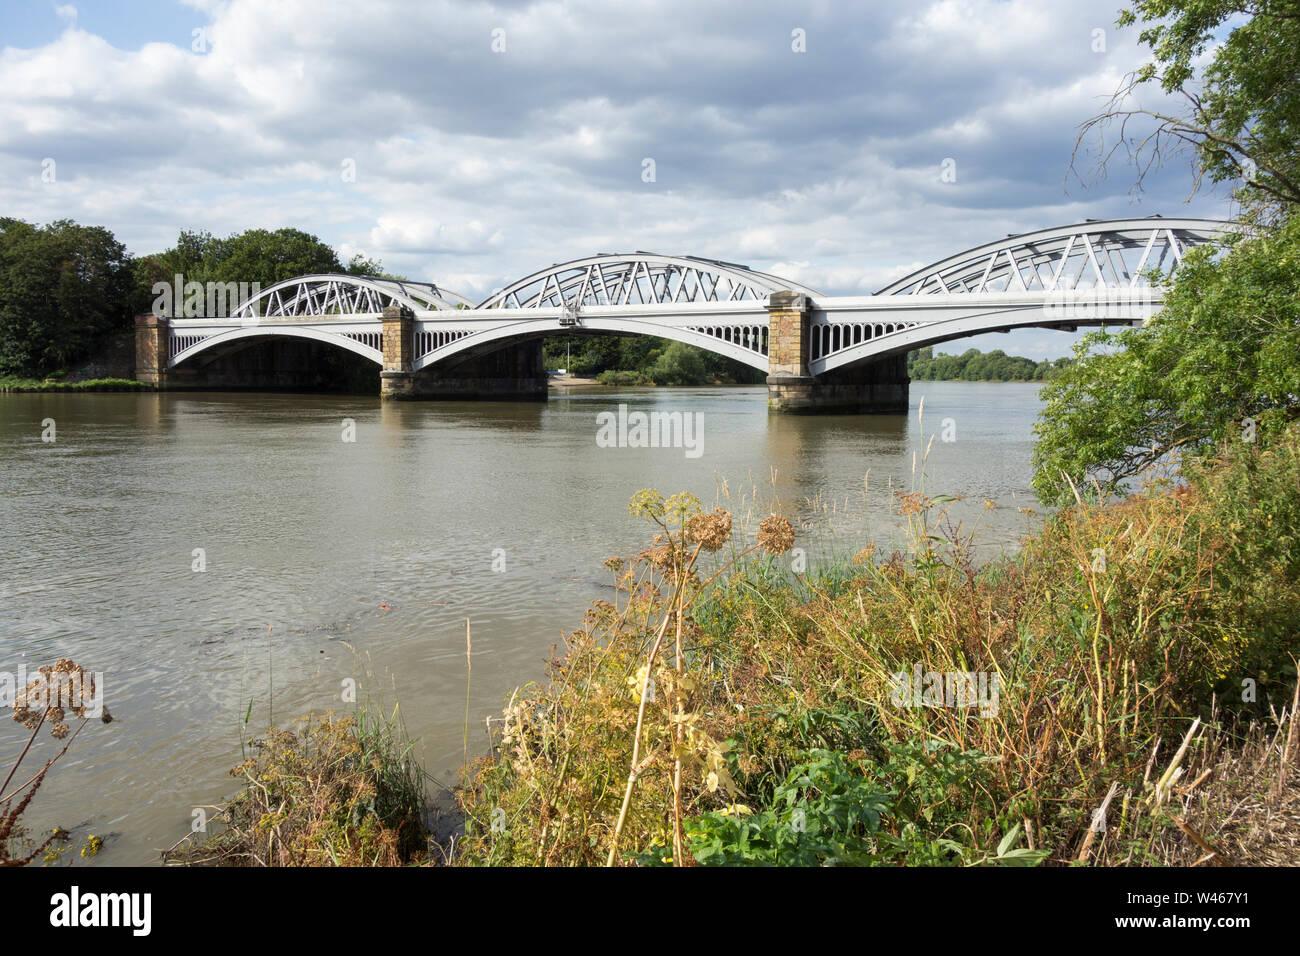 The River Thames flowing peacefully under Joseph Locke's Barnes Railway Bridge, Barnes, London, UK Stock Photo